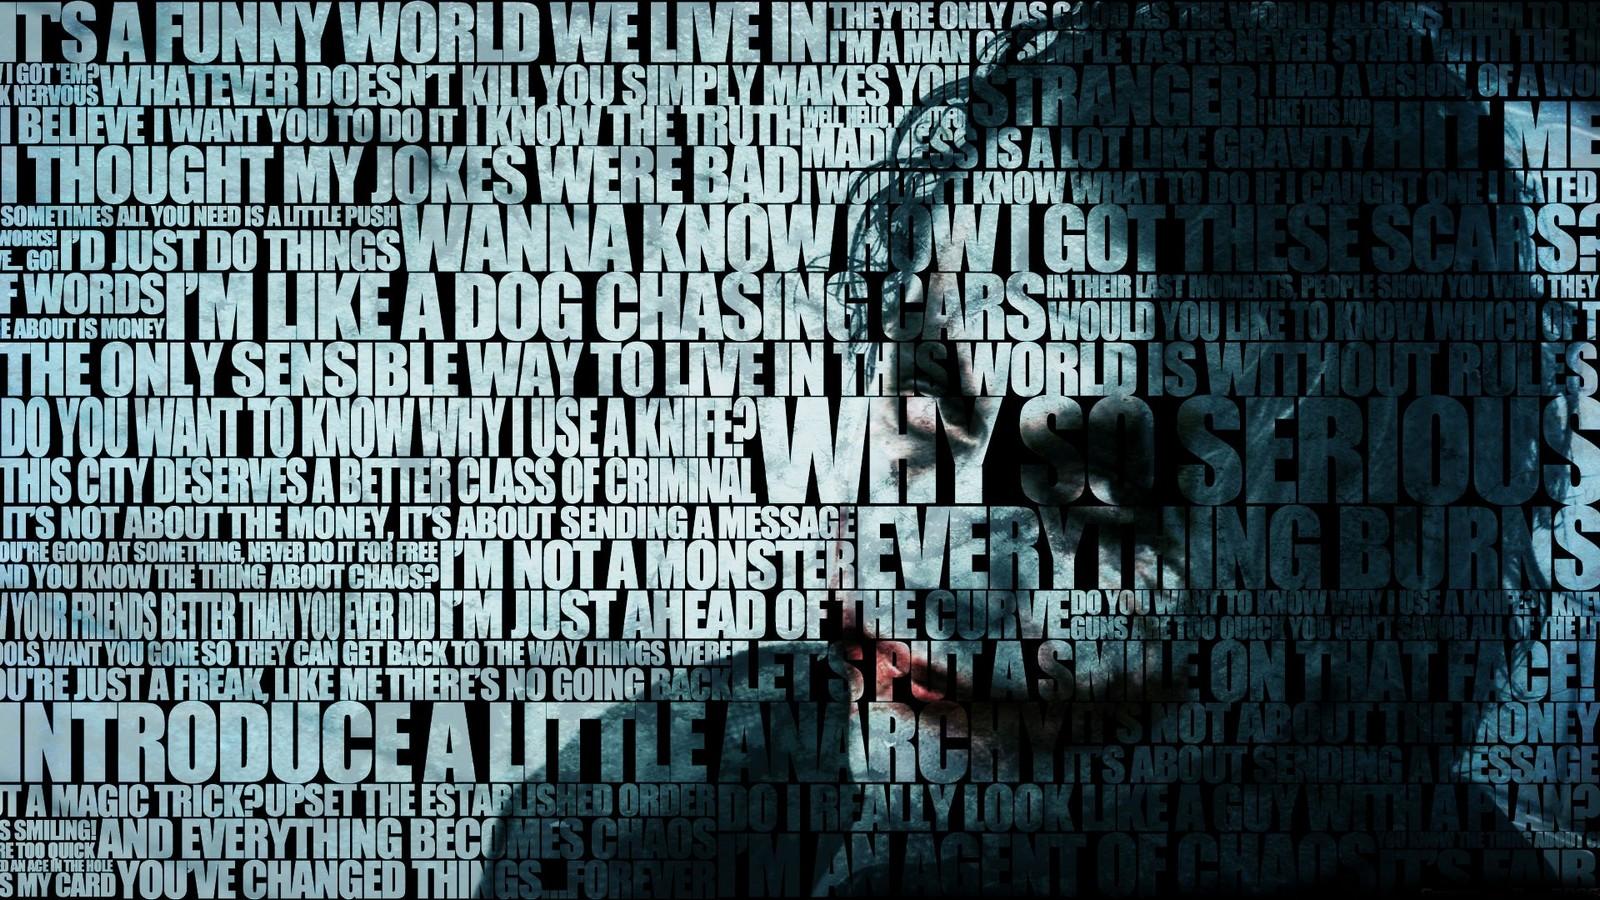 http://4.bp.blogspot.com/-Ax7qHFyj7UQ/TyFIGqNK8HI/AAAAAAAAJzg/C47dbkfrj4Q/s1600/batman-joker-wallpaper.jpg